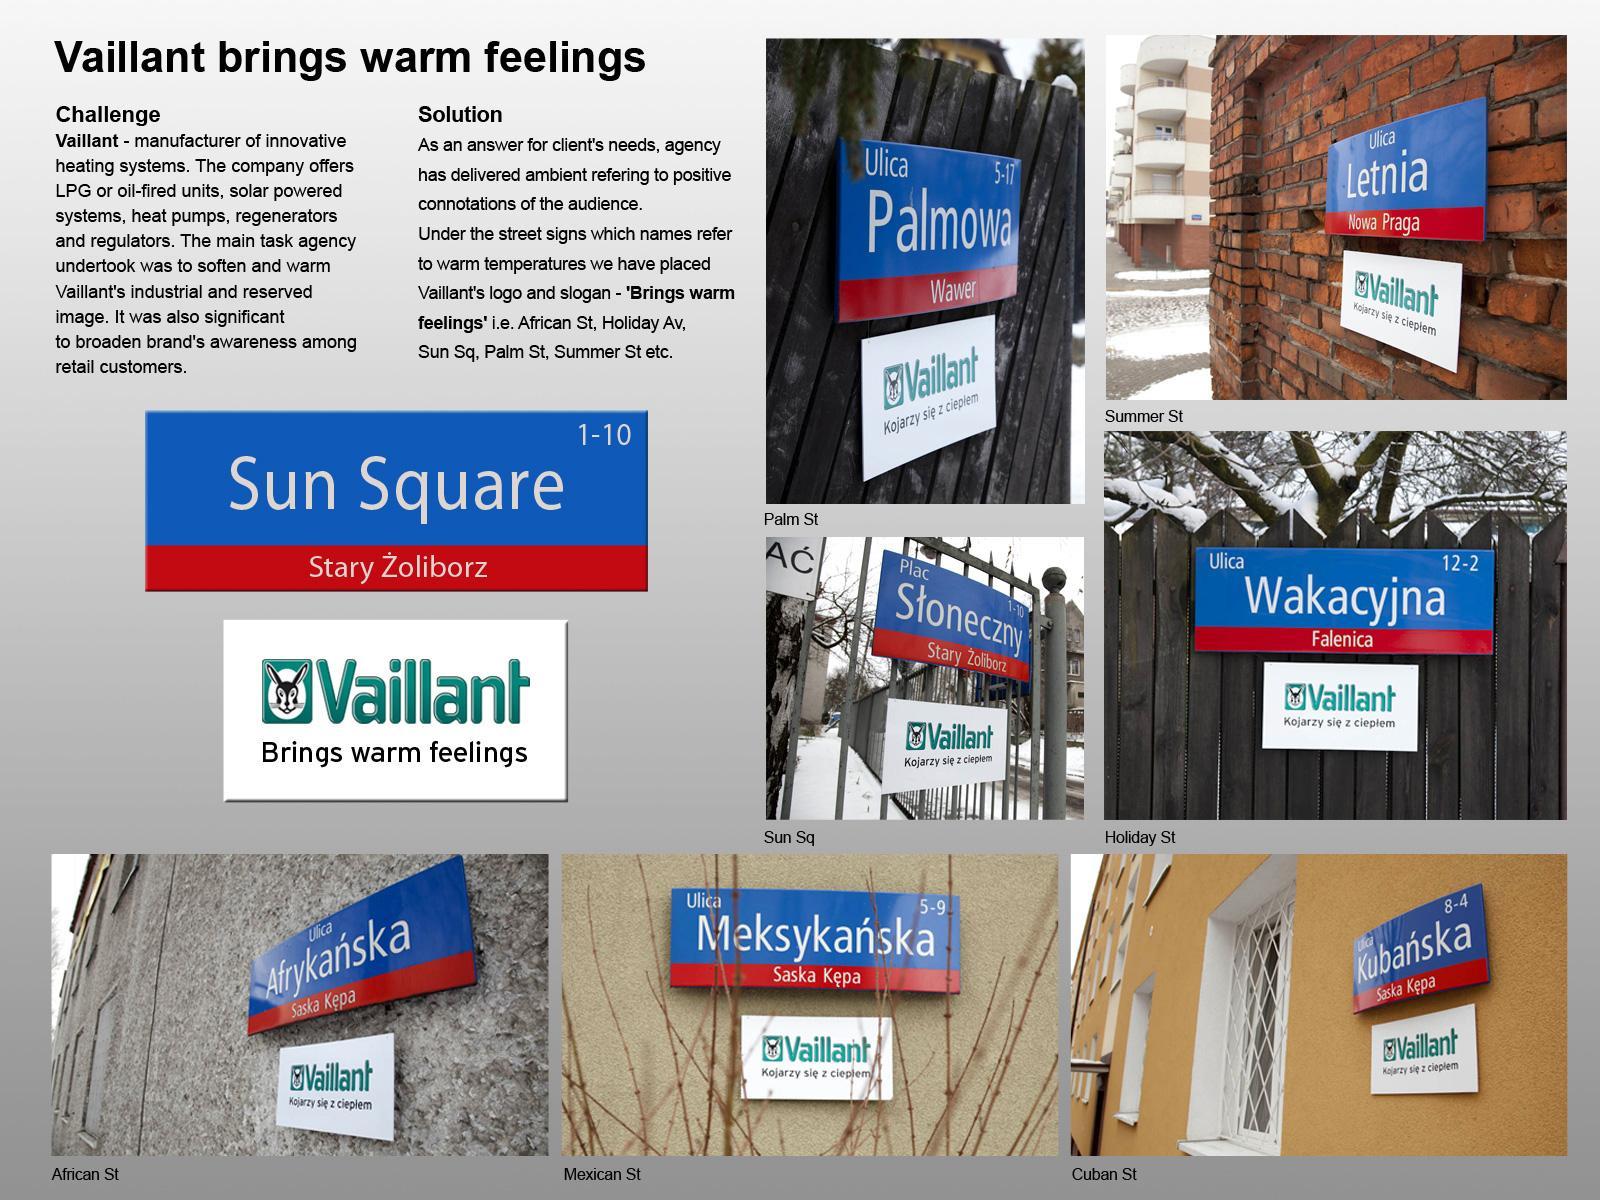 Vaillant Ambient Ad -  Brings warm feelings